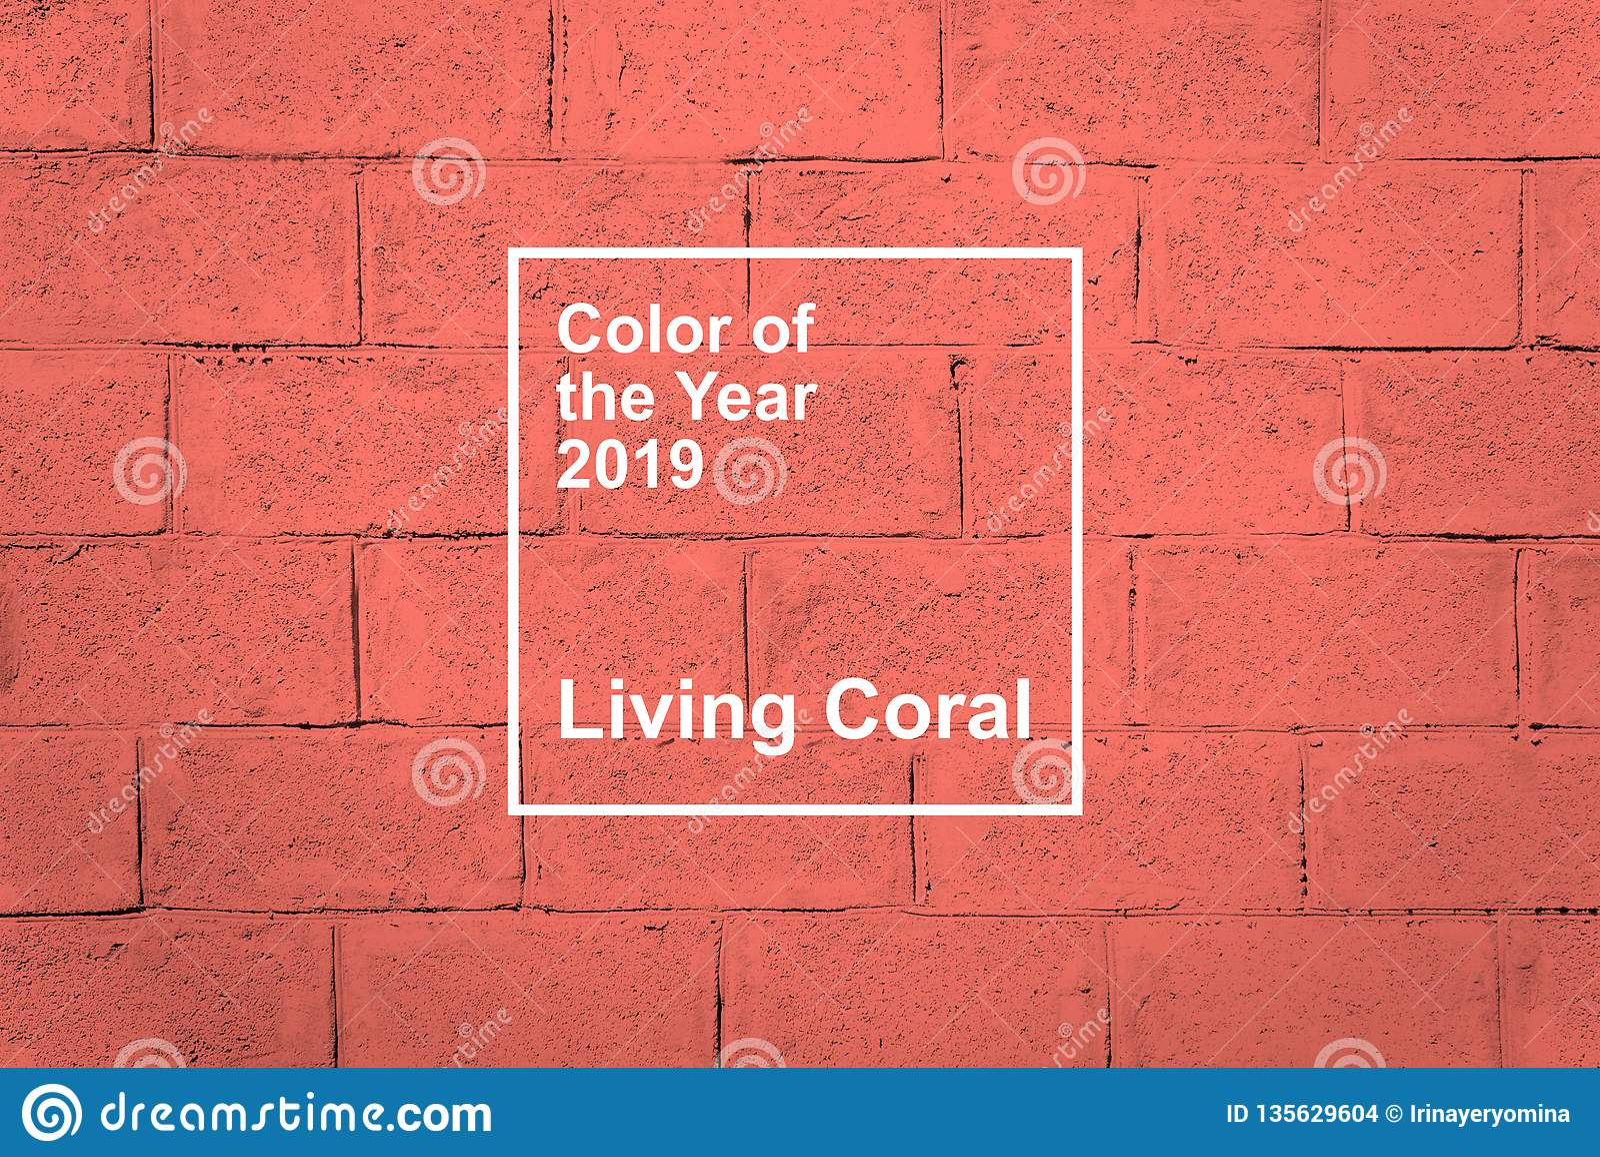 KROPIVNITSKIY, UKRAINE – 06 December, 2018: Living Coral, Pantone color of the year 2019 fabric textile background. Living